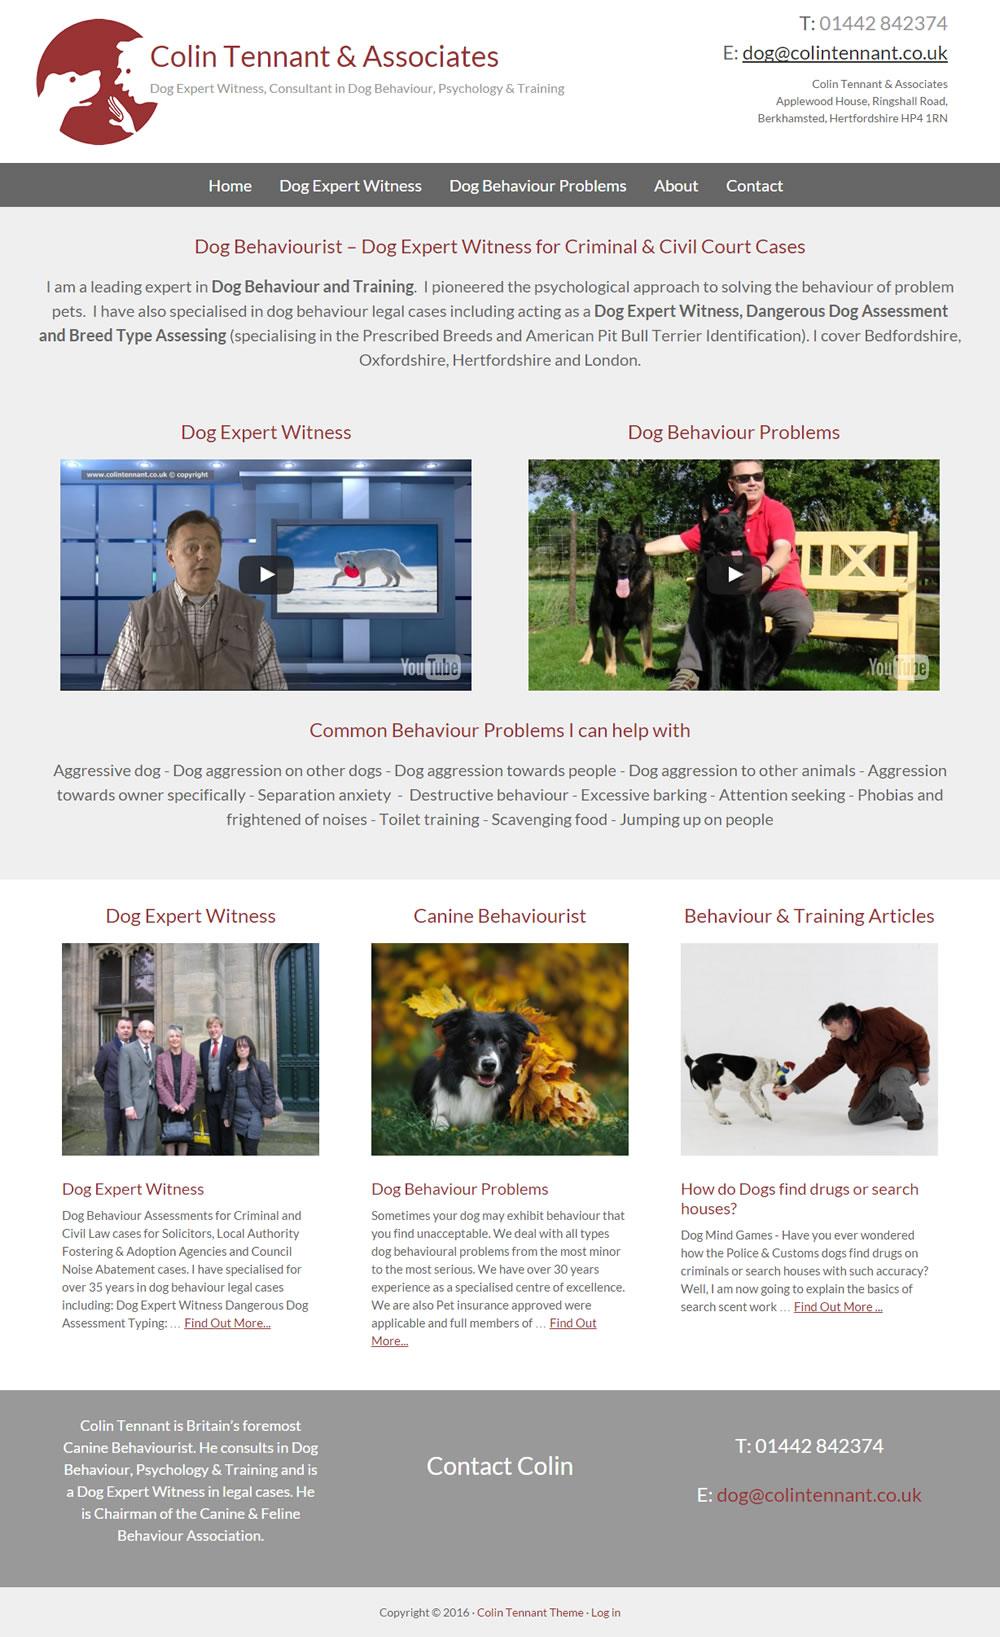 Web Design for Colin Tennant dog behaviourist